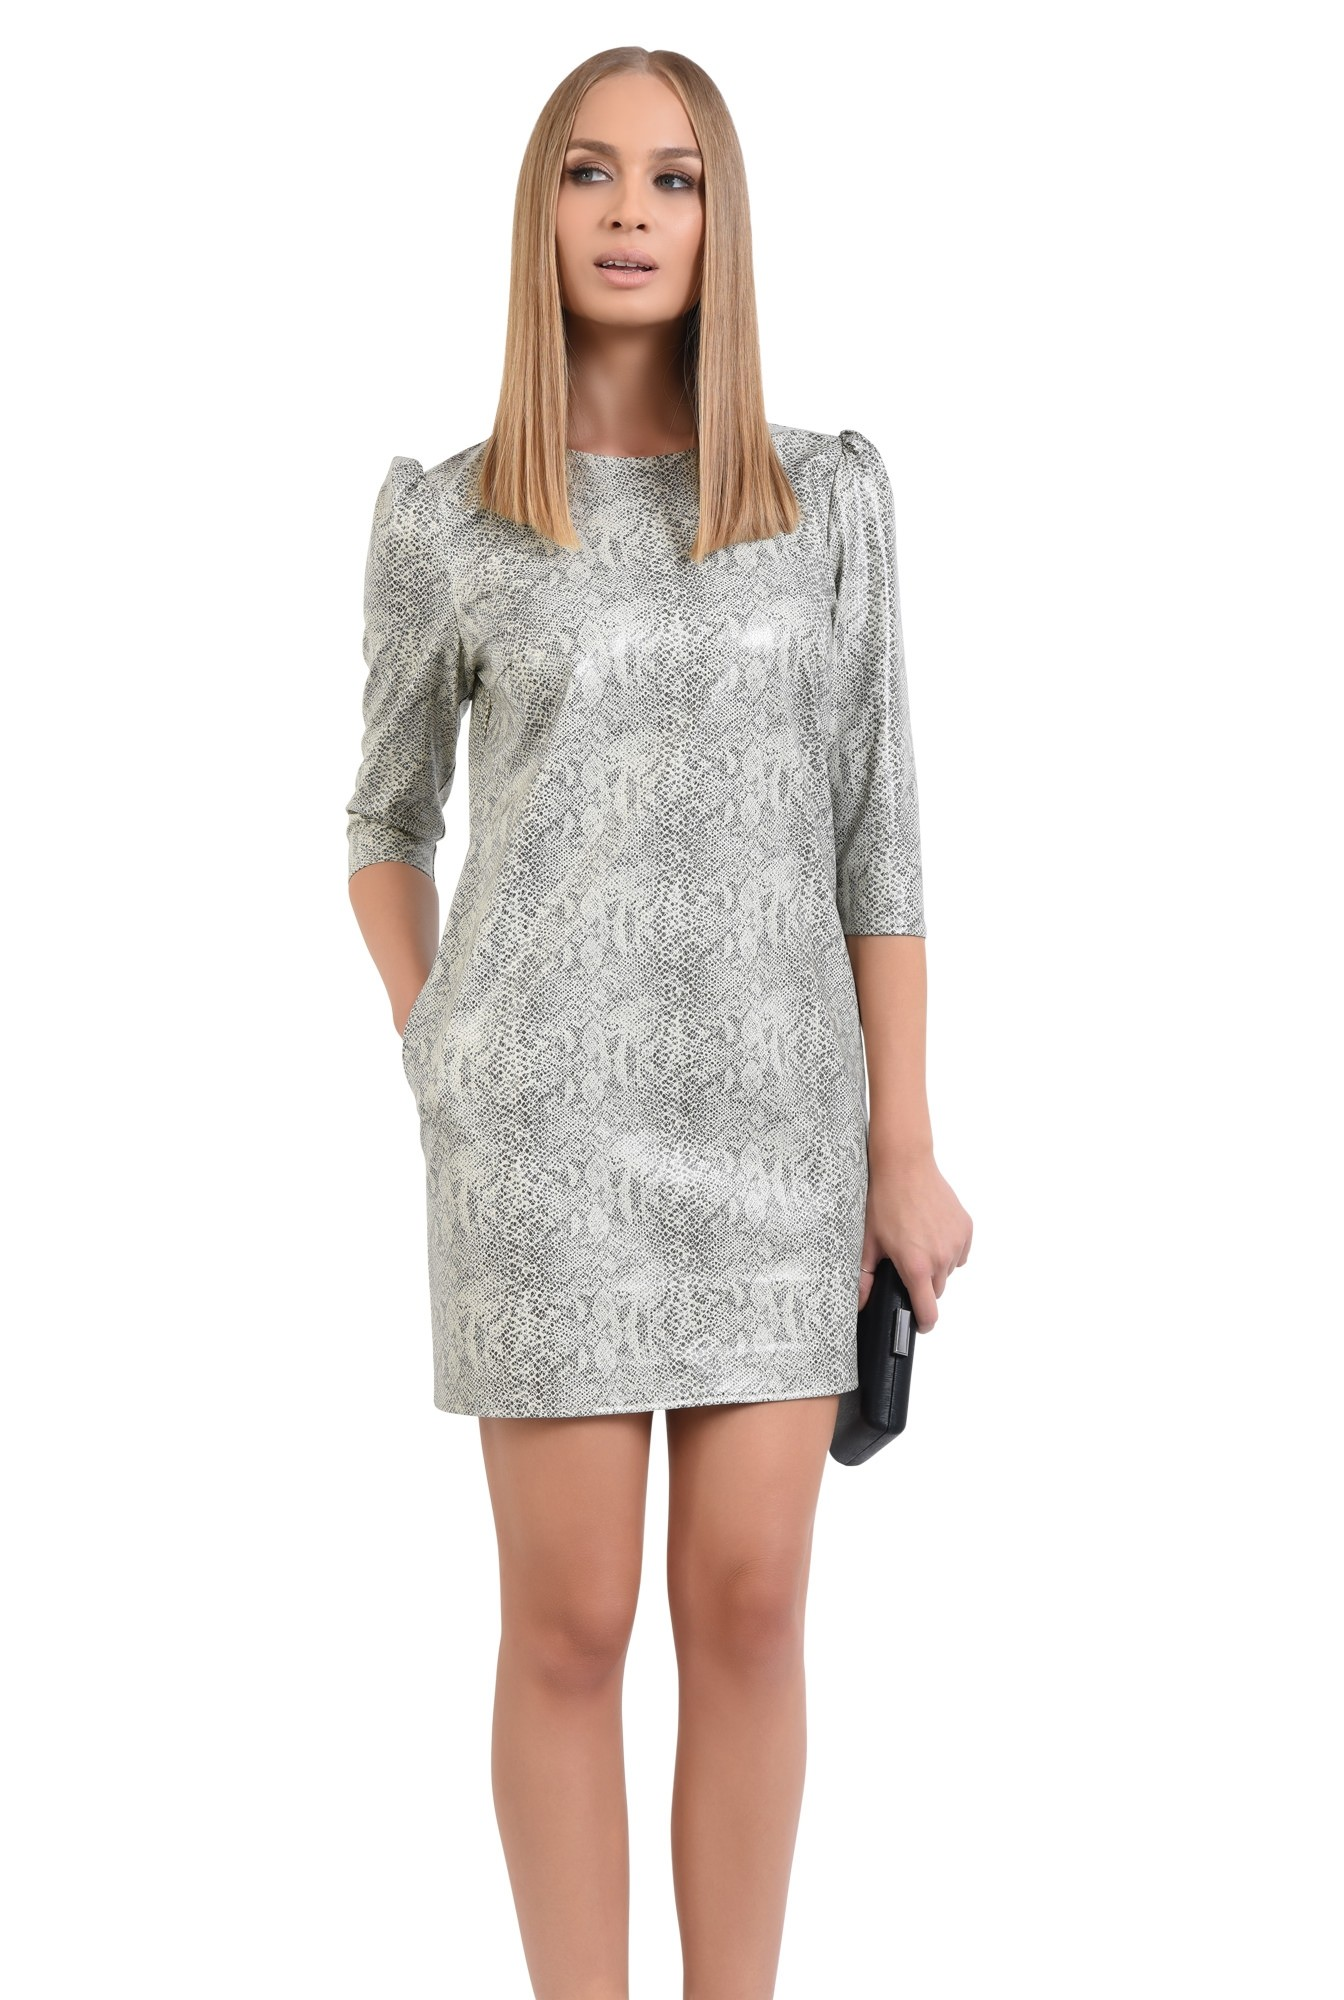 rochie casual, piele eco, snakeskin, rochii online